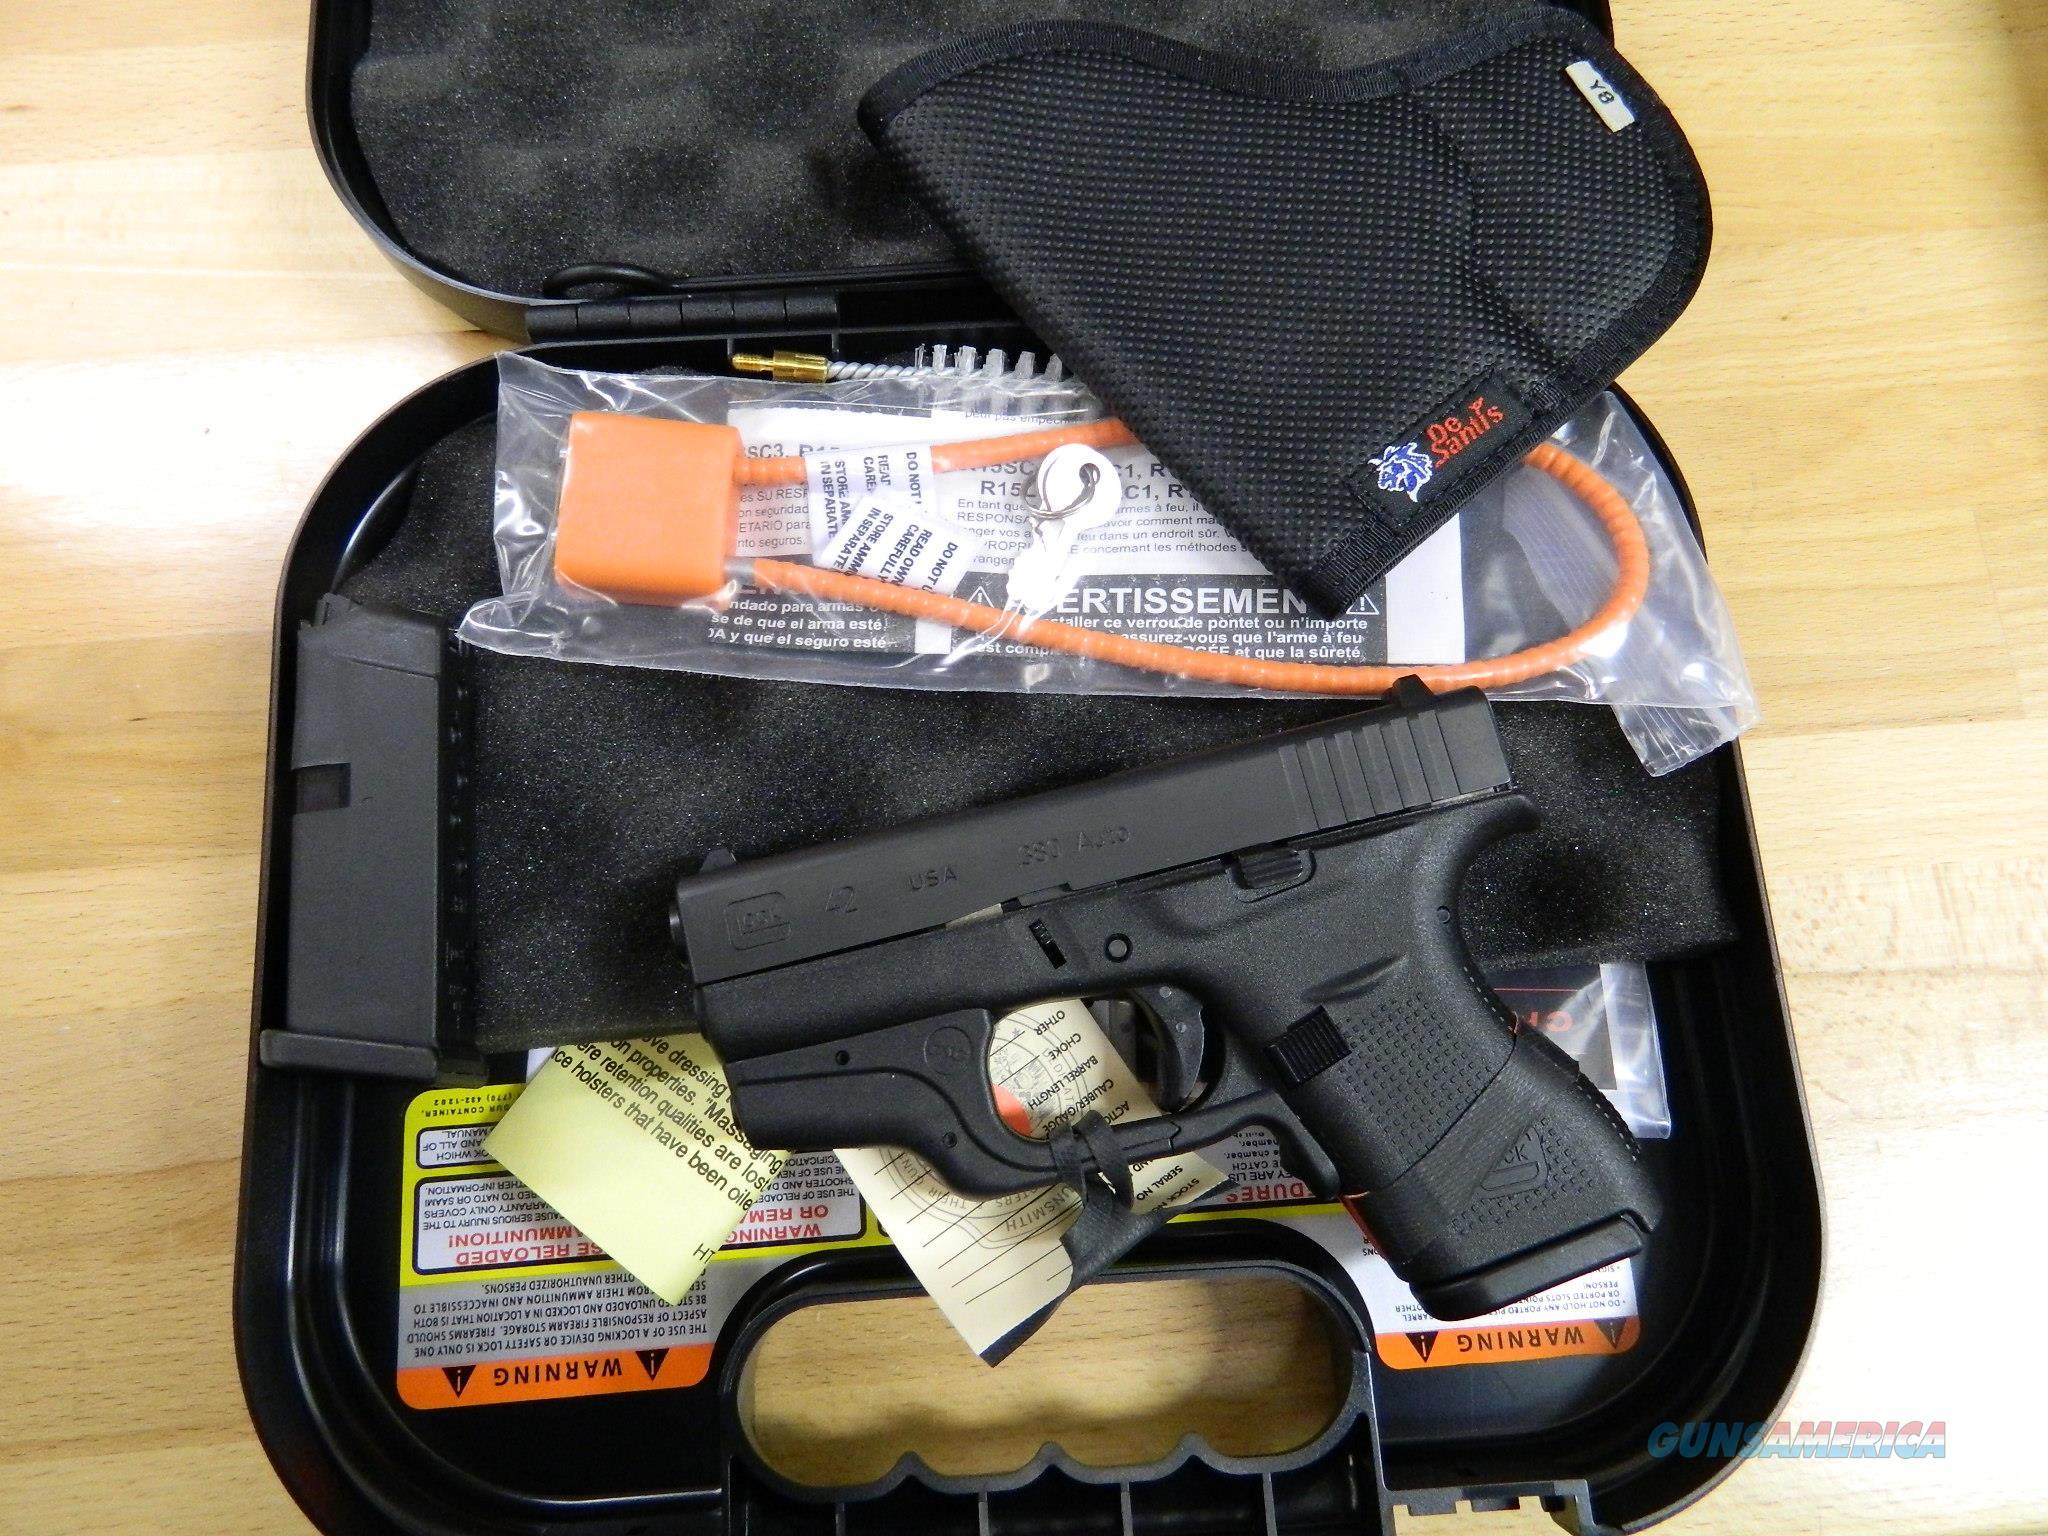 GLOCK 42 with Crimson Trace Laser New in Box , holster  .380 ACP  Guns > Pistols > Glock Pistols > 42